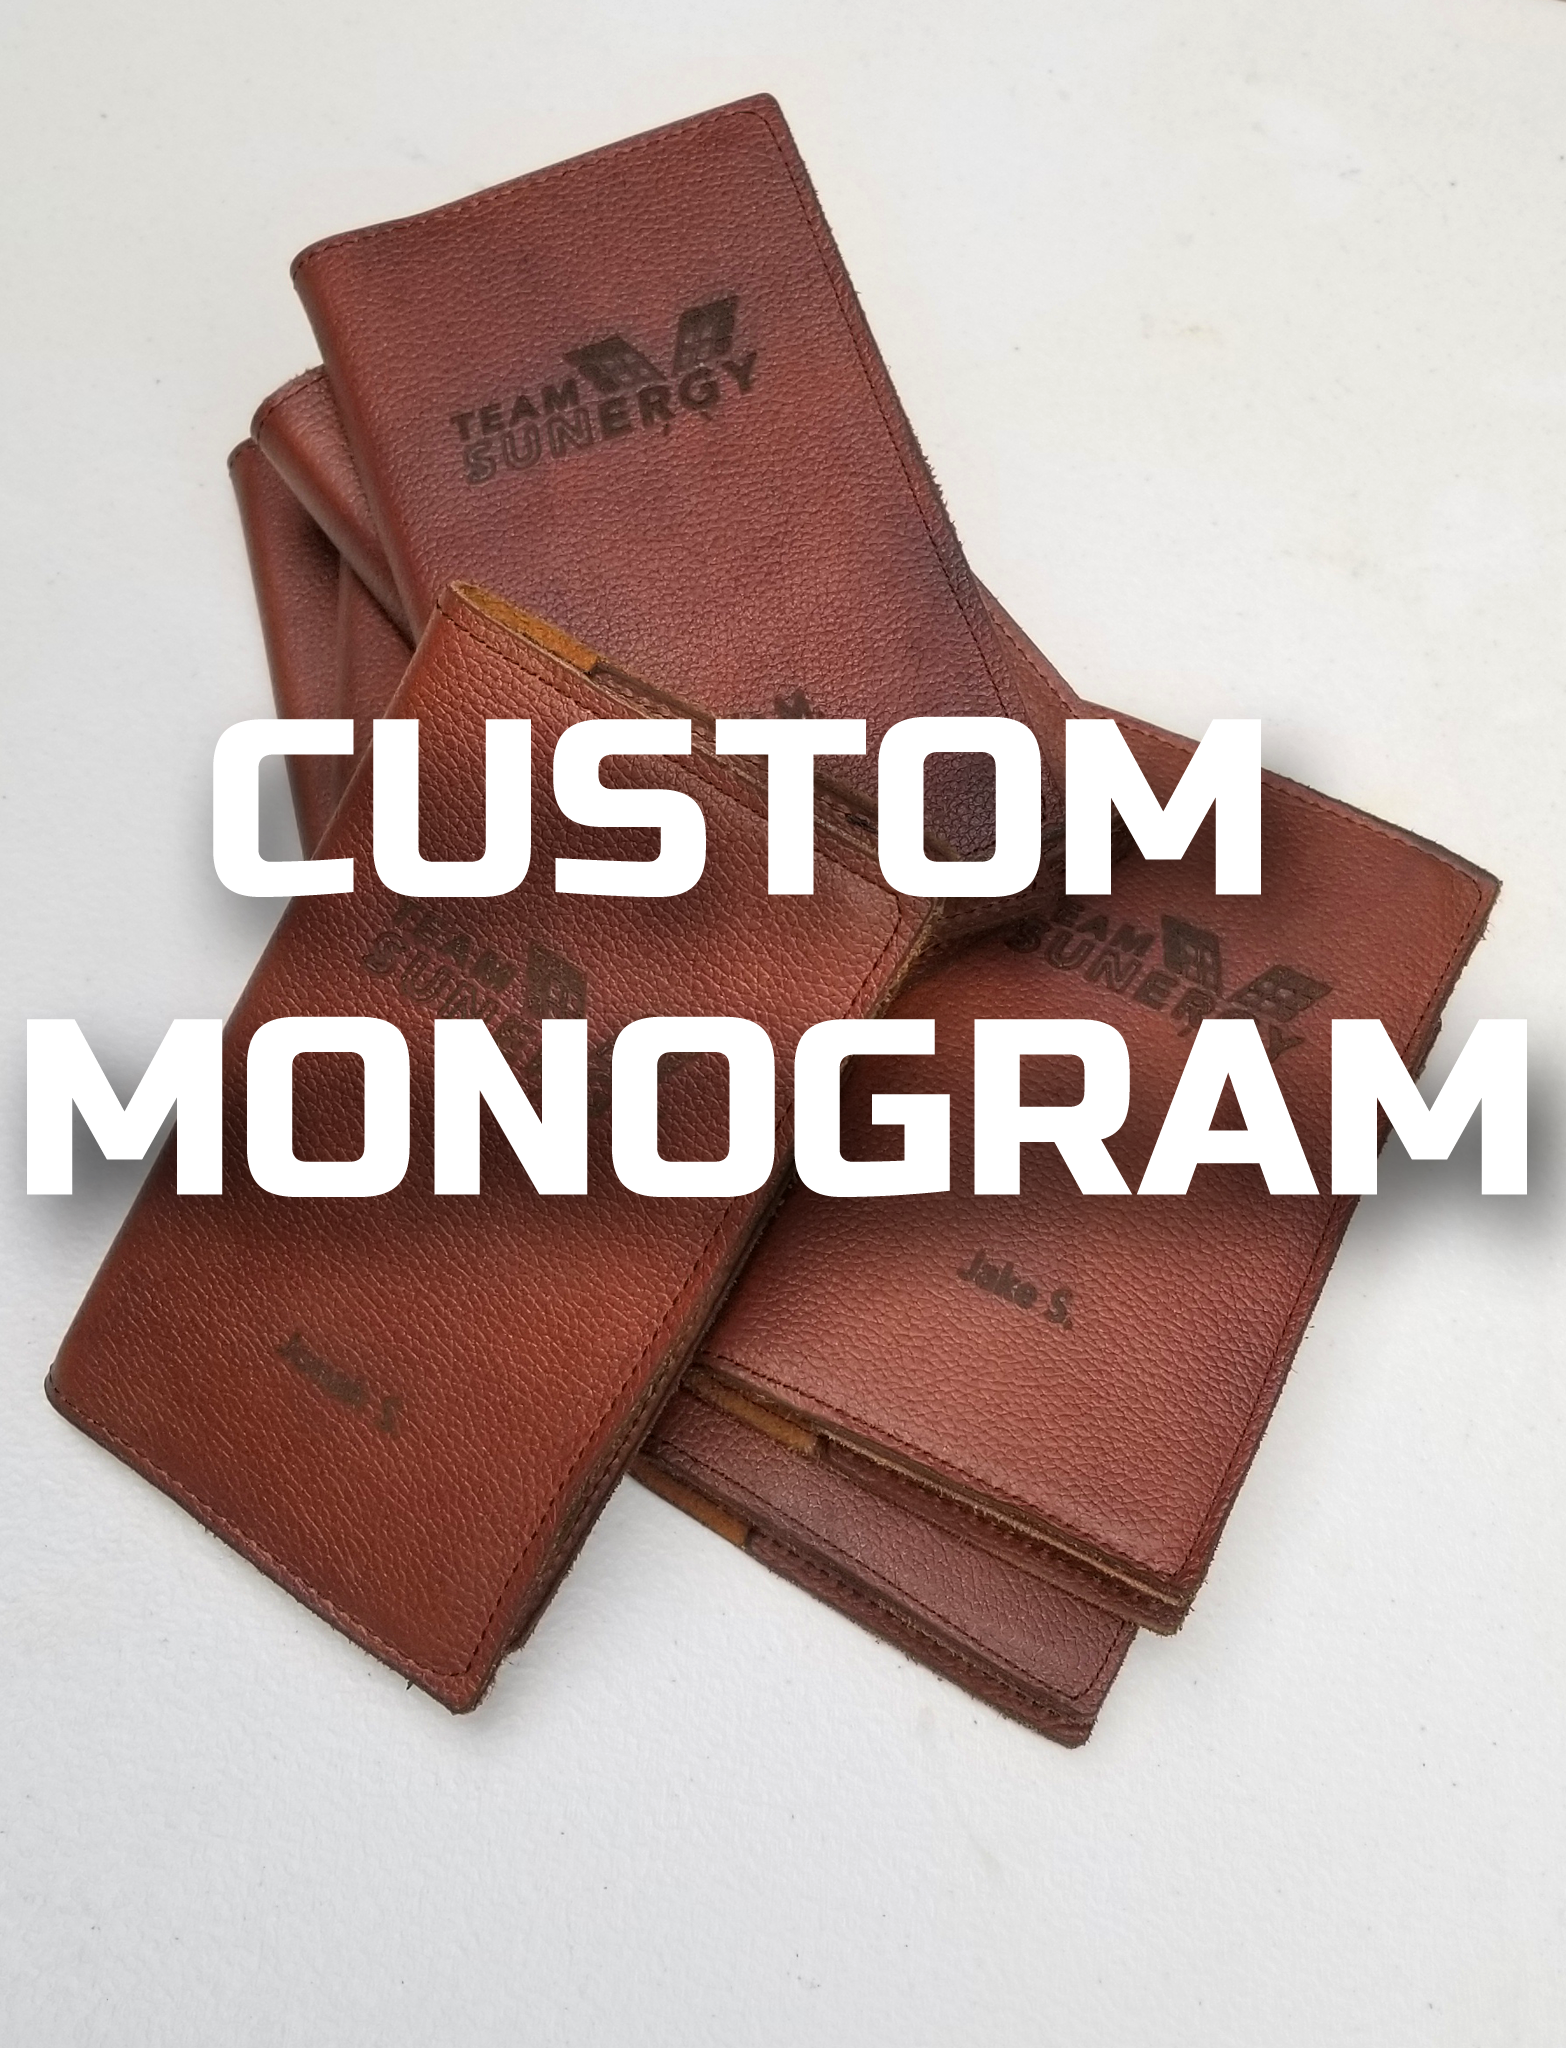 Custom Monogram Cover Photo.png